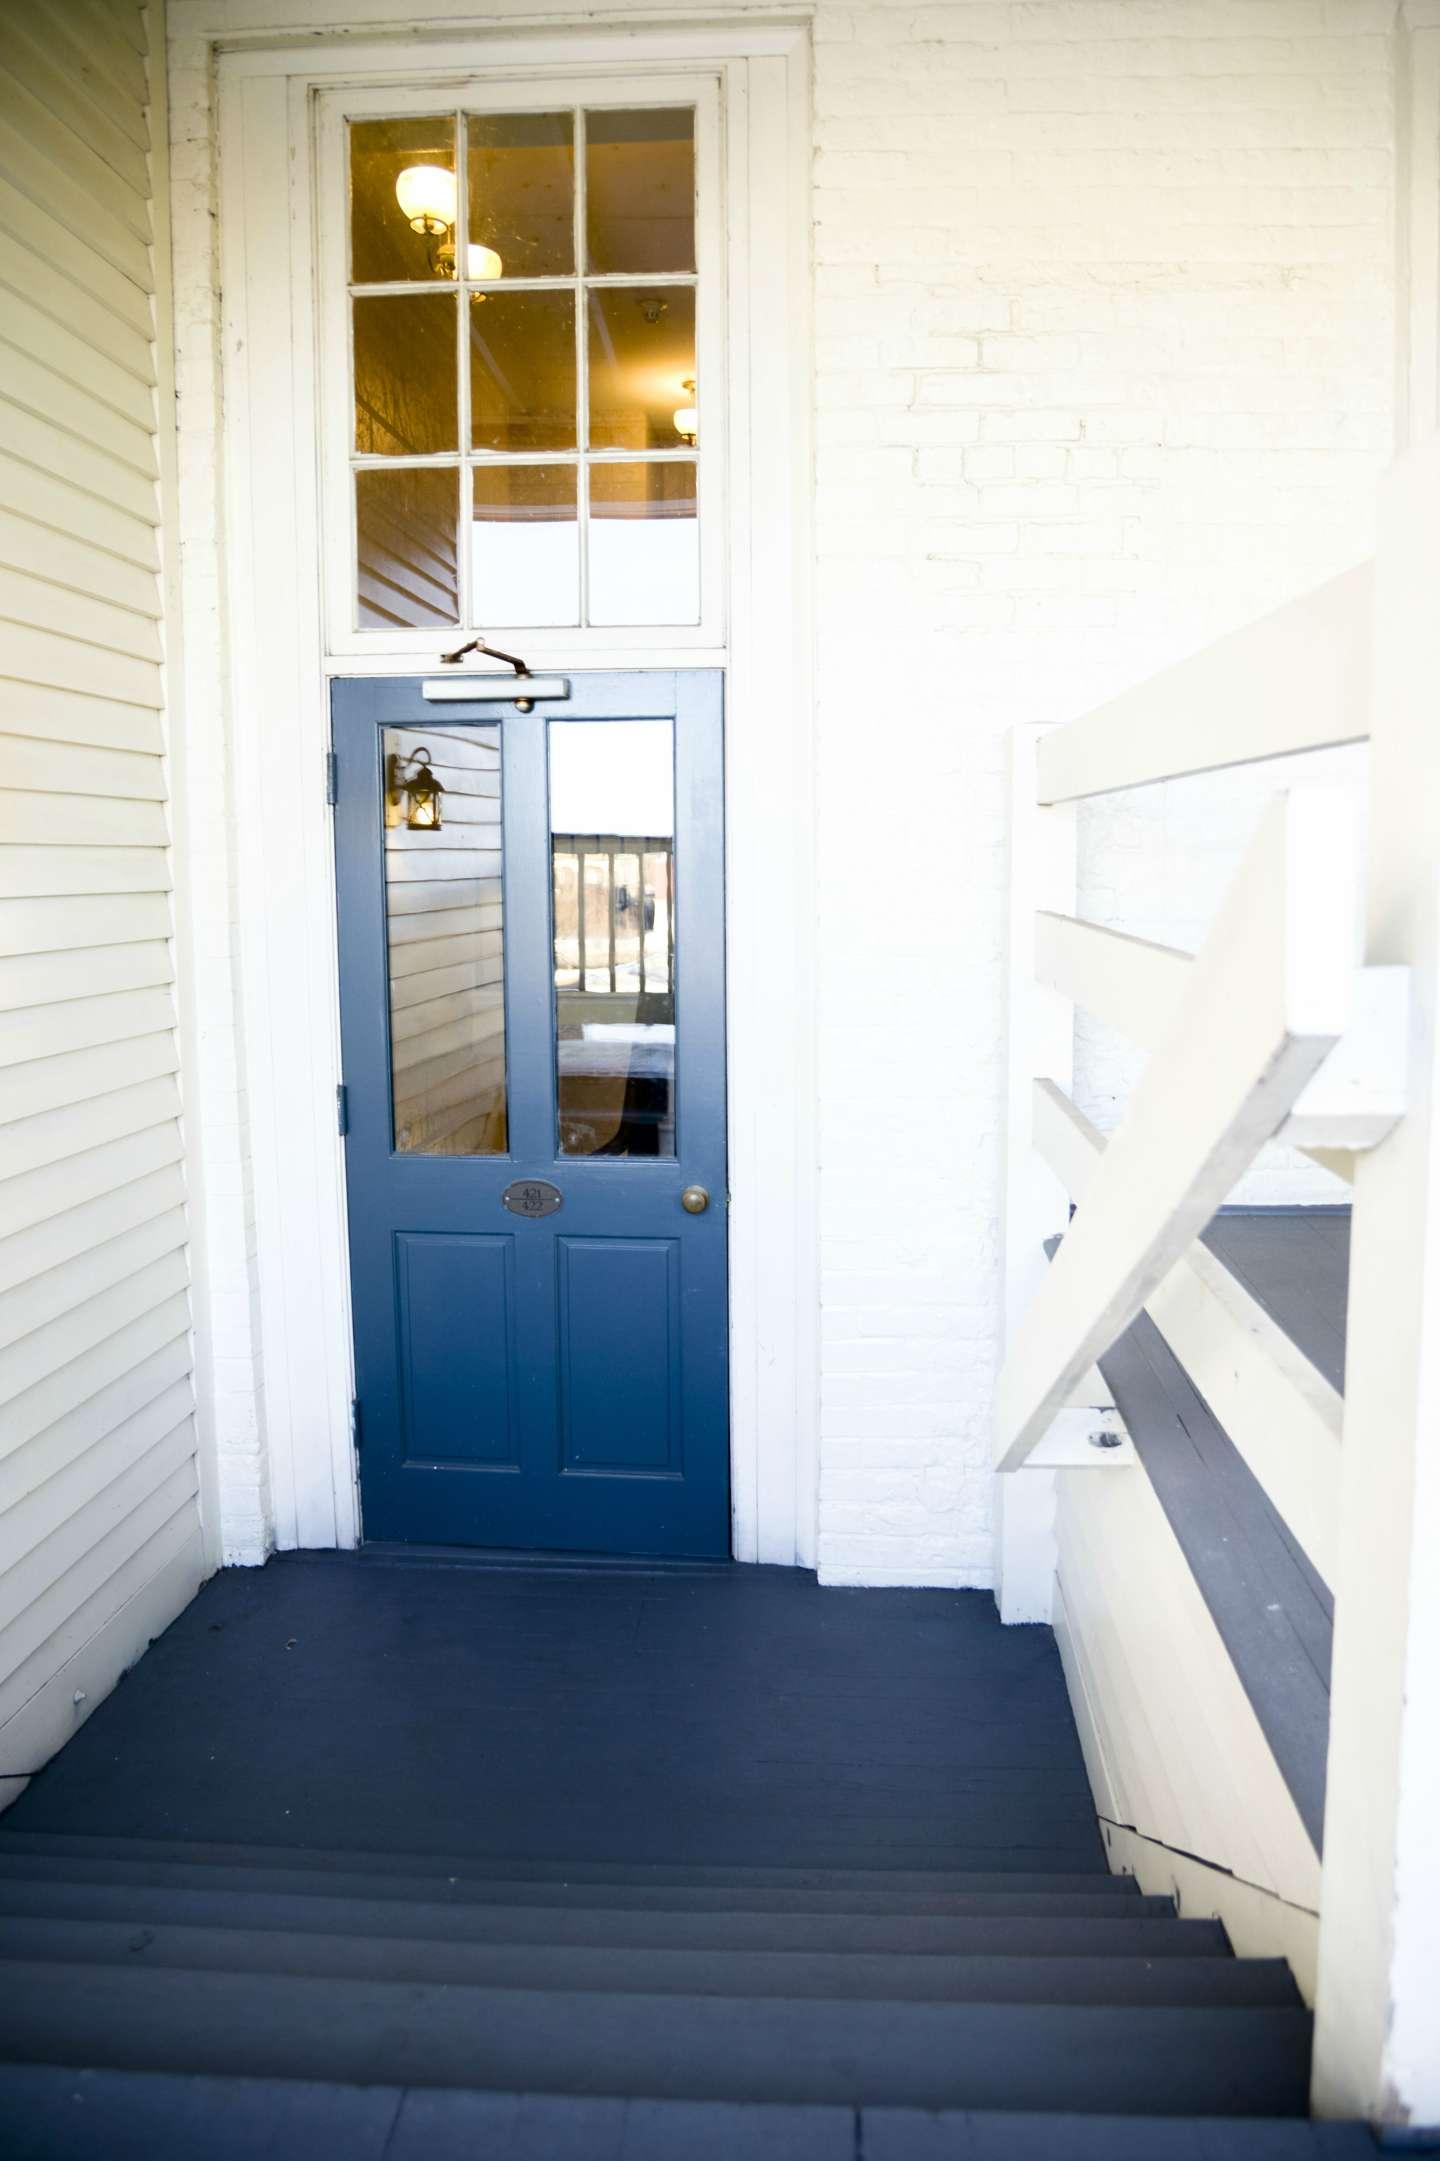 Linden Row Inn & Max's on Broad in Richmond, VA - I'm Fixin' To - @mbg0112